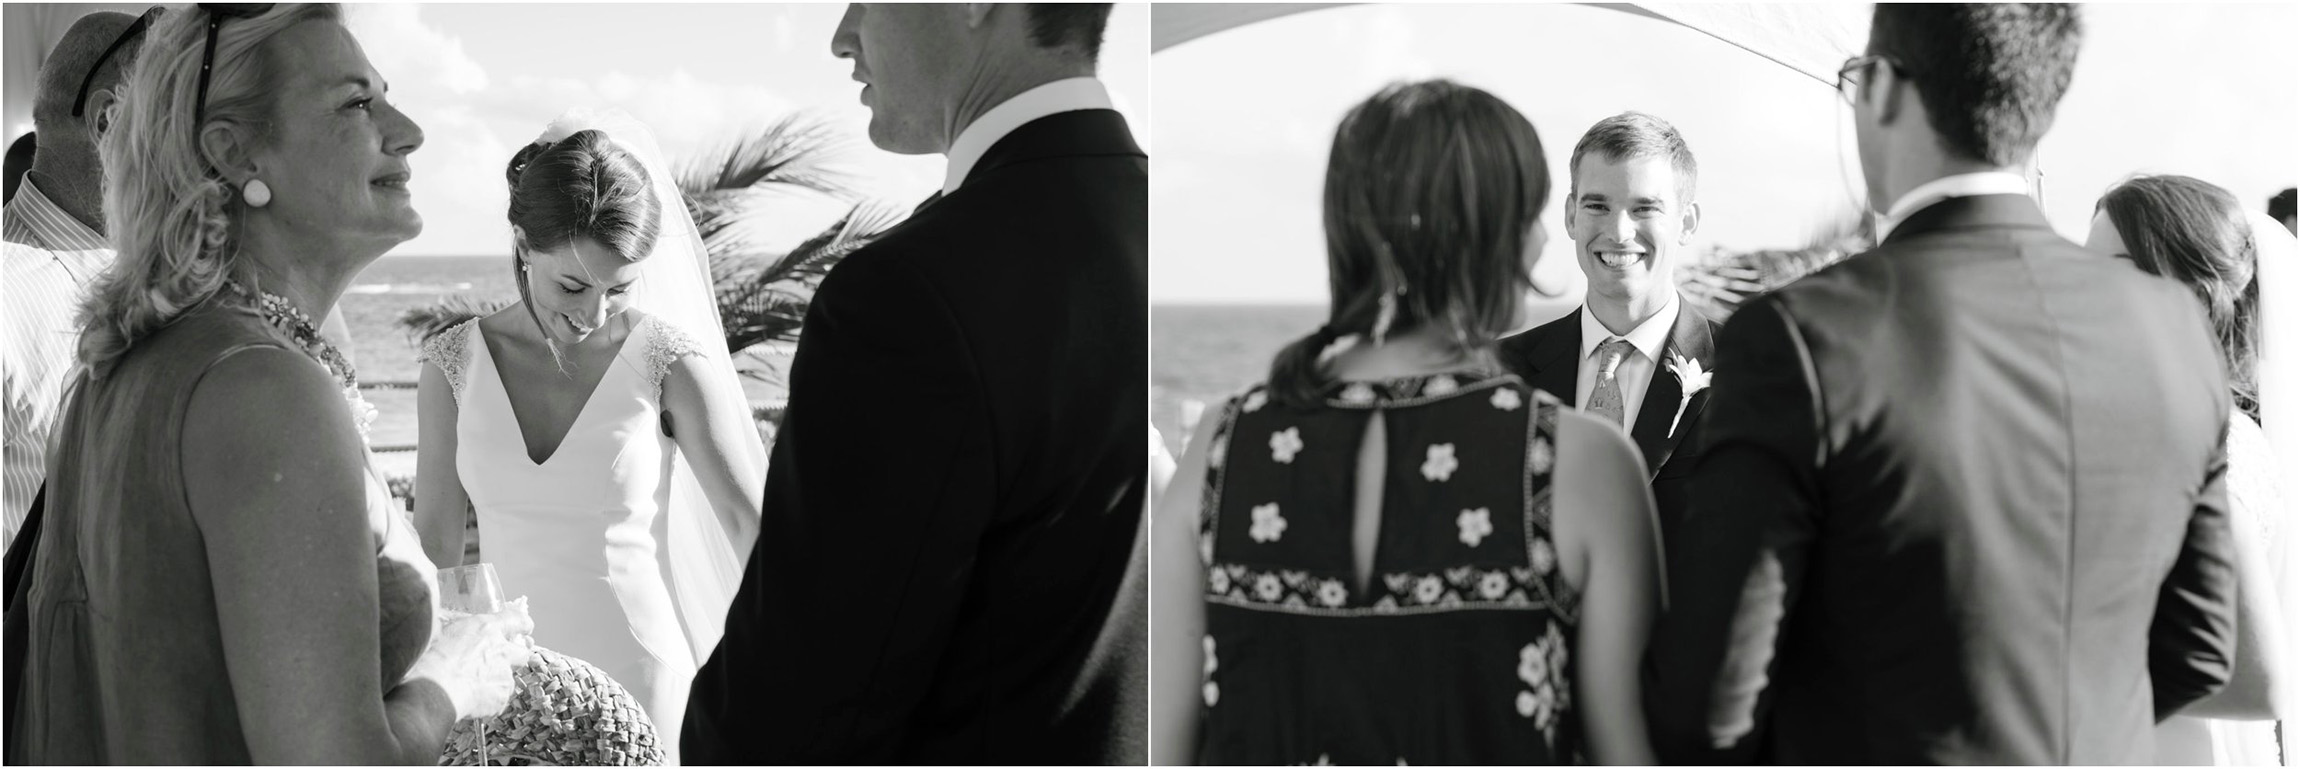 ©FianderFoto_Bermuda Wedding Photographer_Mid Ocean_Rachel_Angus_066.jpg